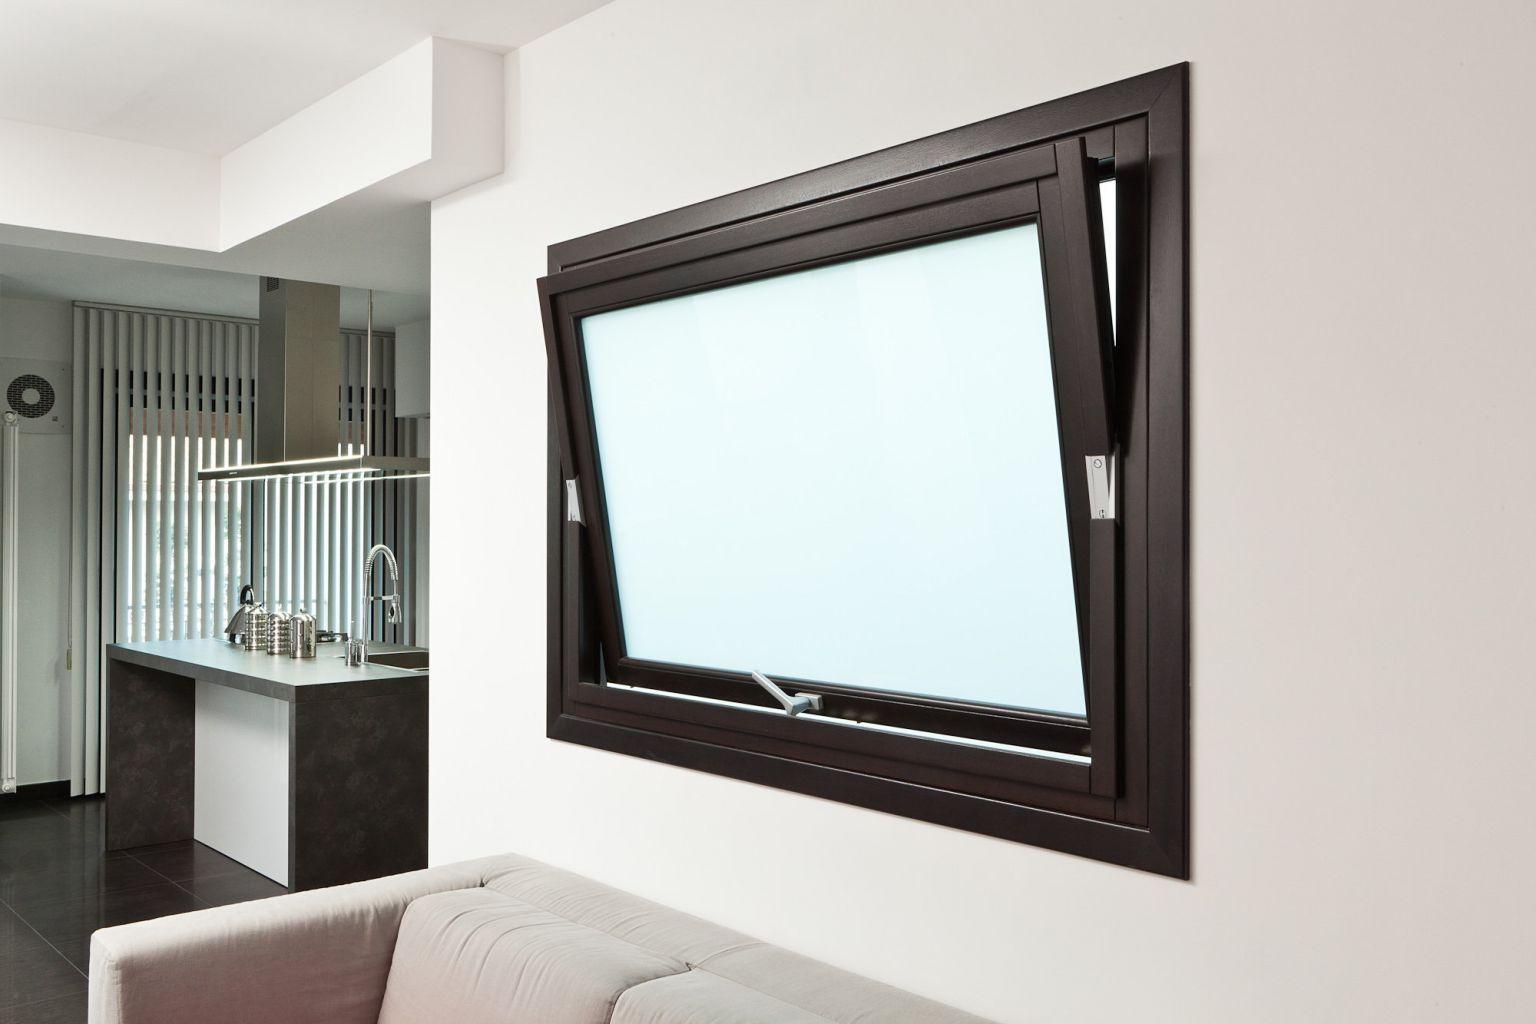 Sistemi e soluzioni di apertura per serramenti di alta for Tipi di finestre